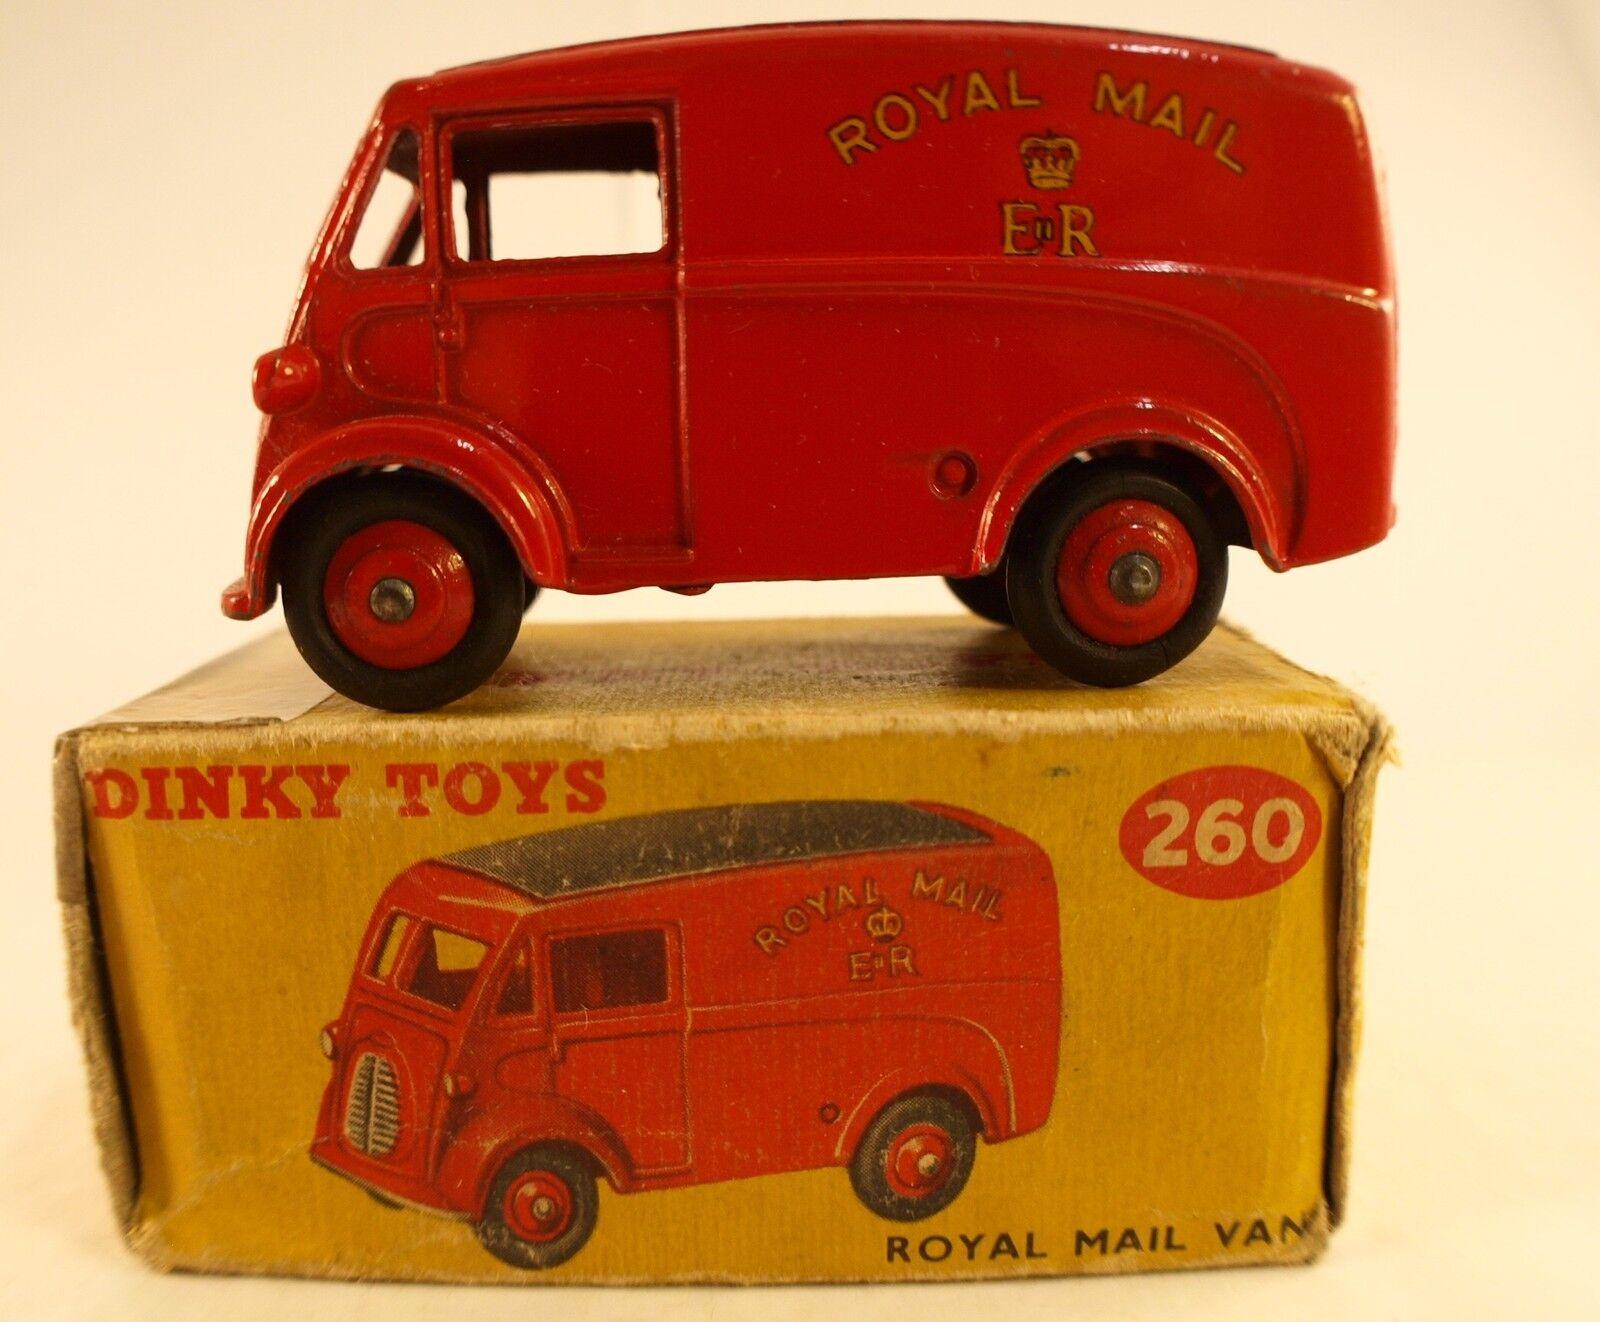 Dinky Toys Royal Box in Van Mail Morris 260 No  GB